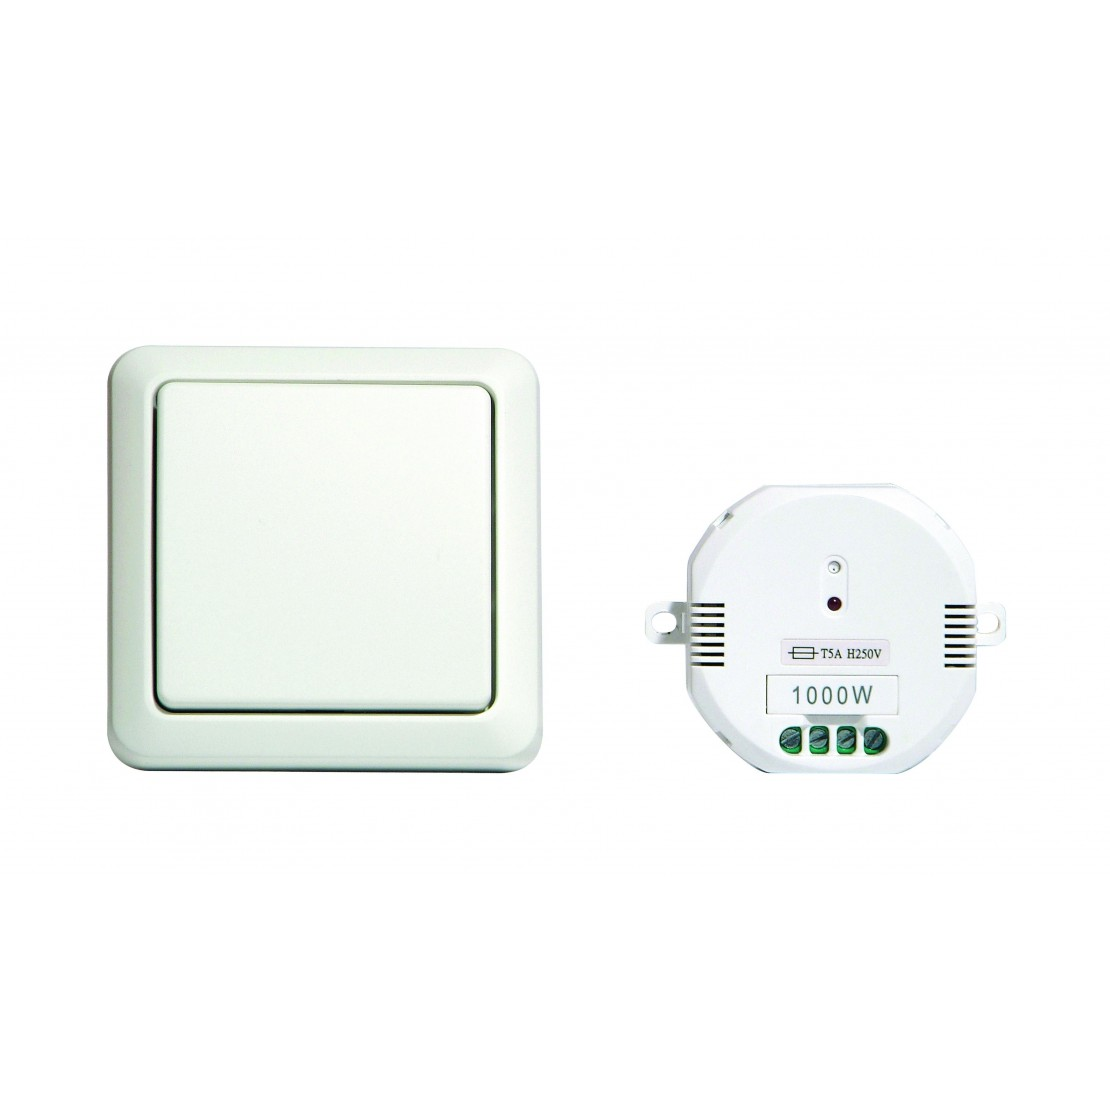 Interrupteur sans fil + Module On/Off (blanc, 1000W)